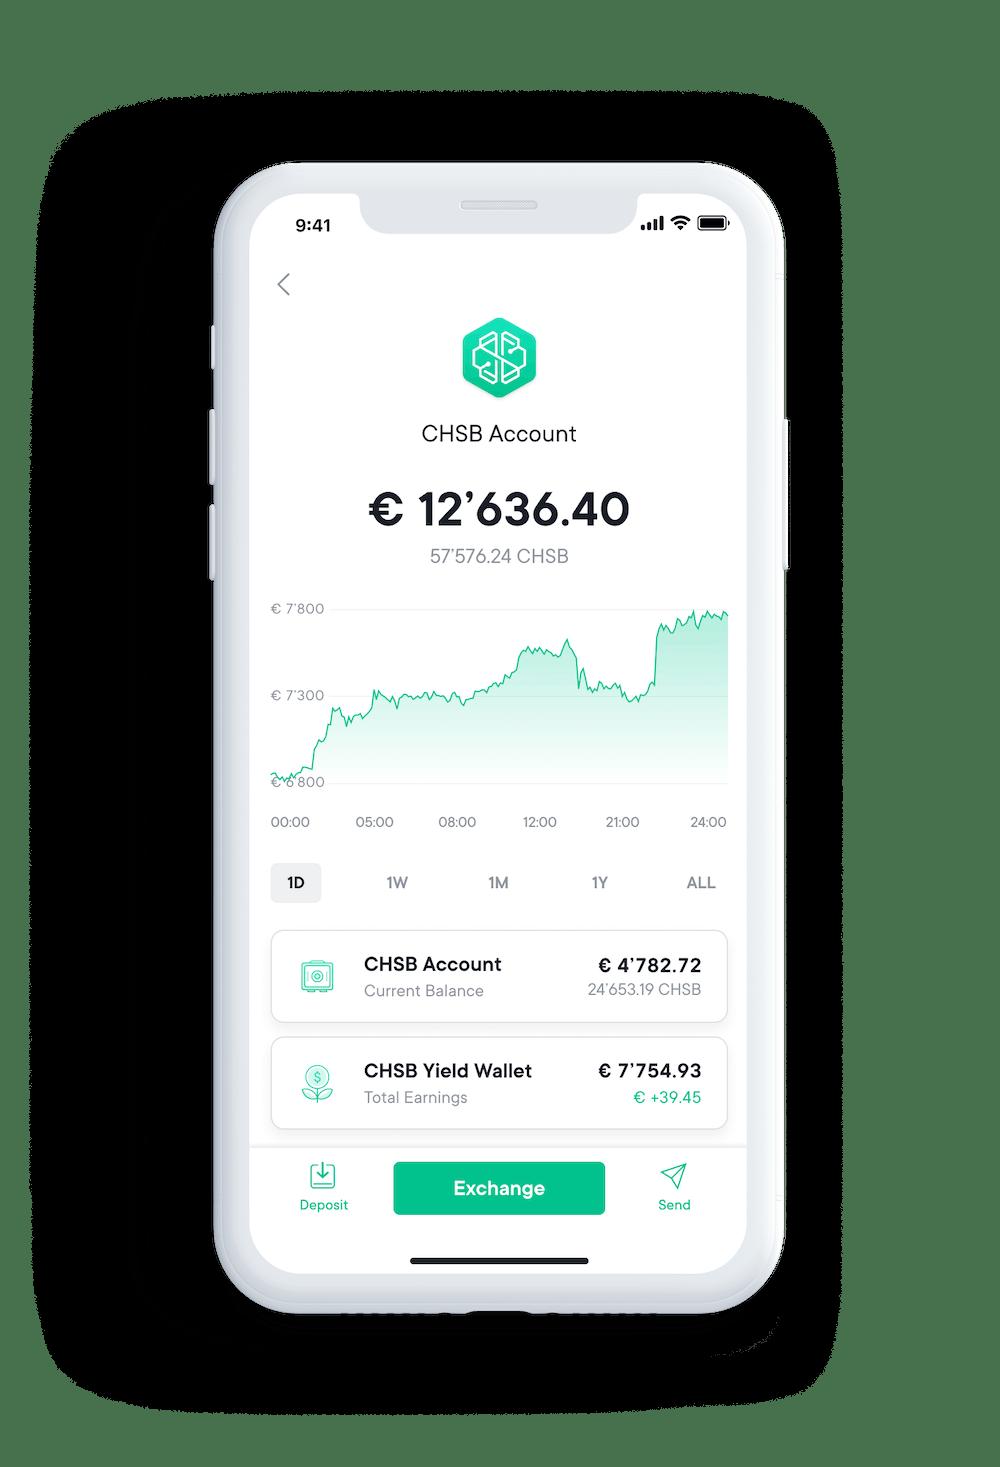 CHSB Yield